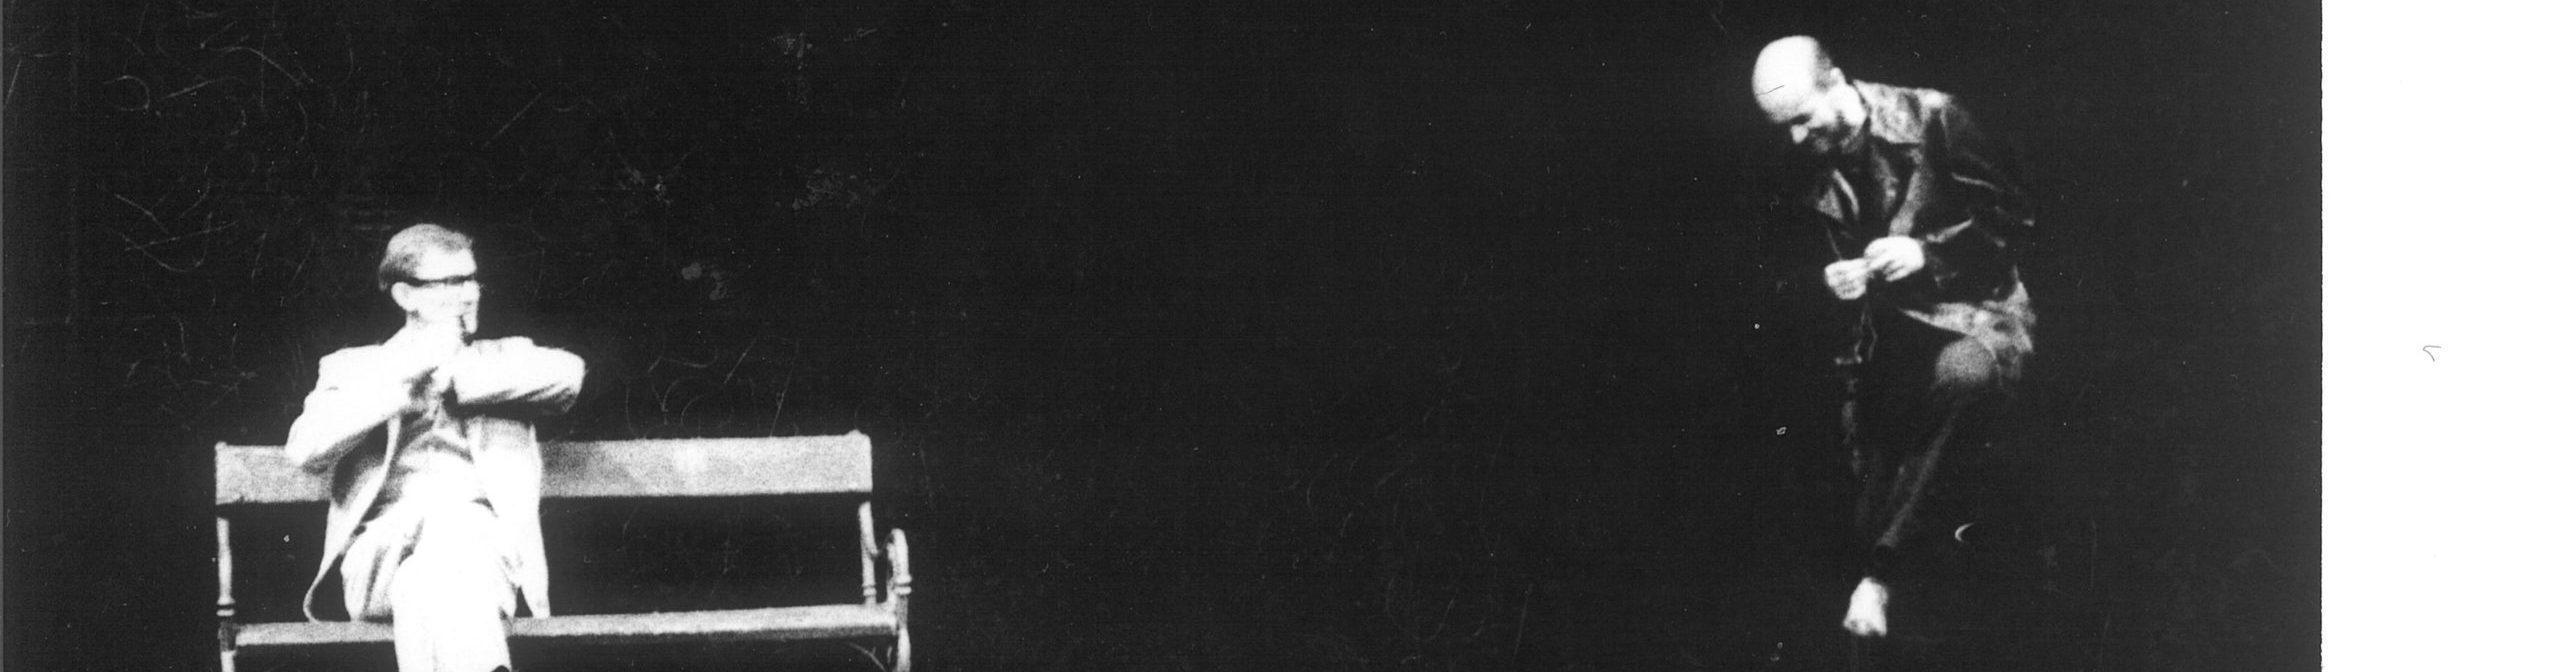 Edward Albee: STALO SE VZOO